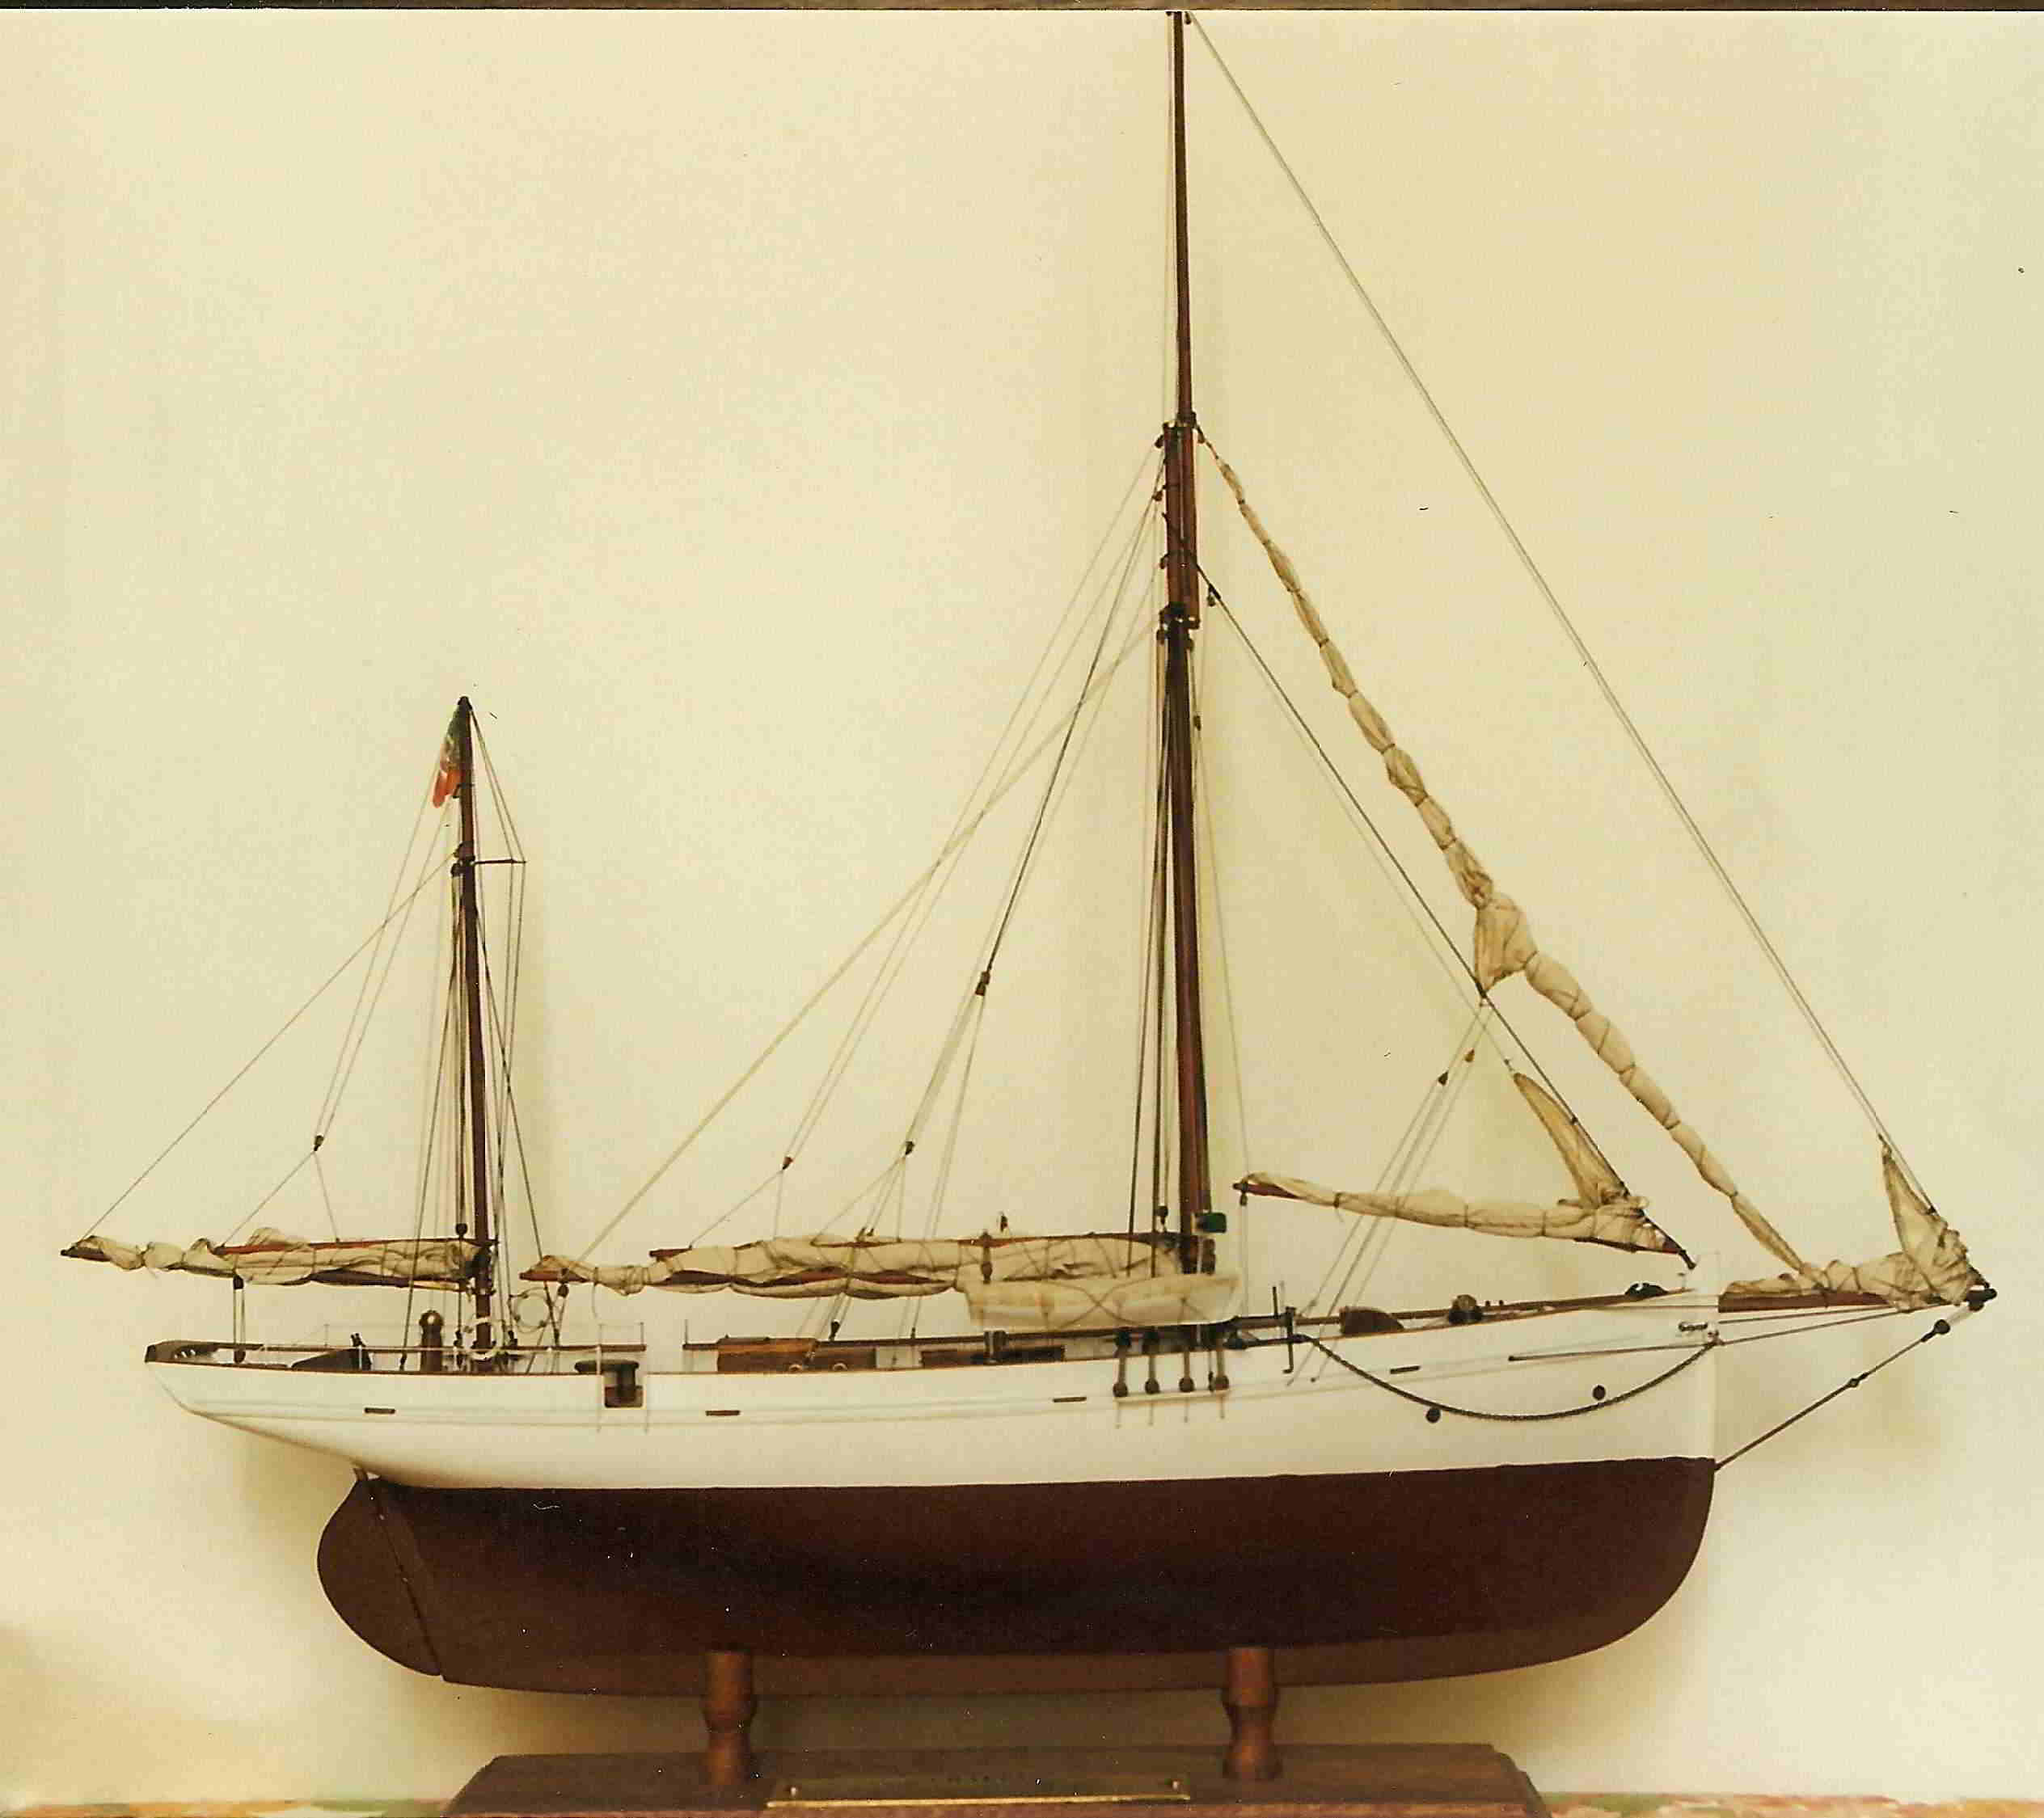 yacht Grappa - modelli navali